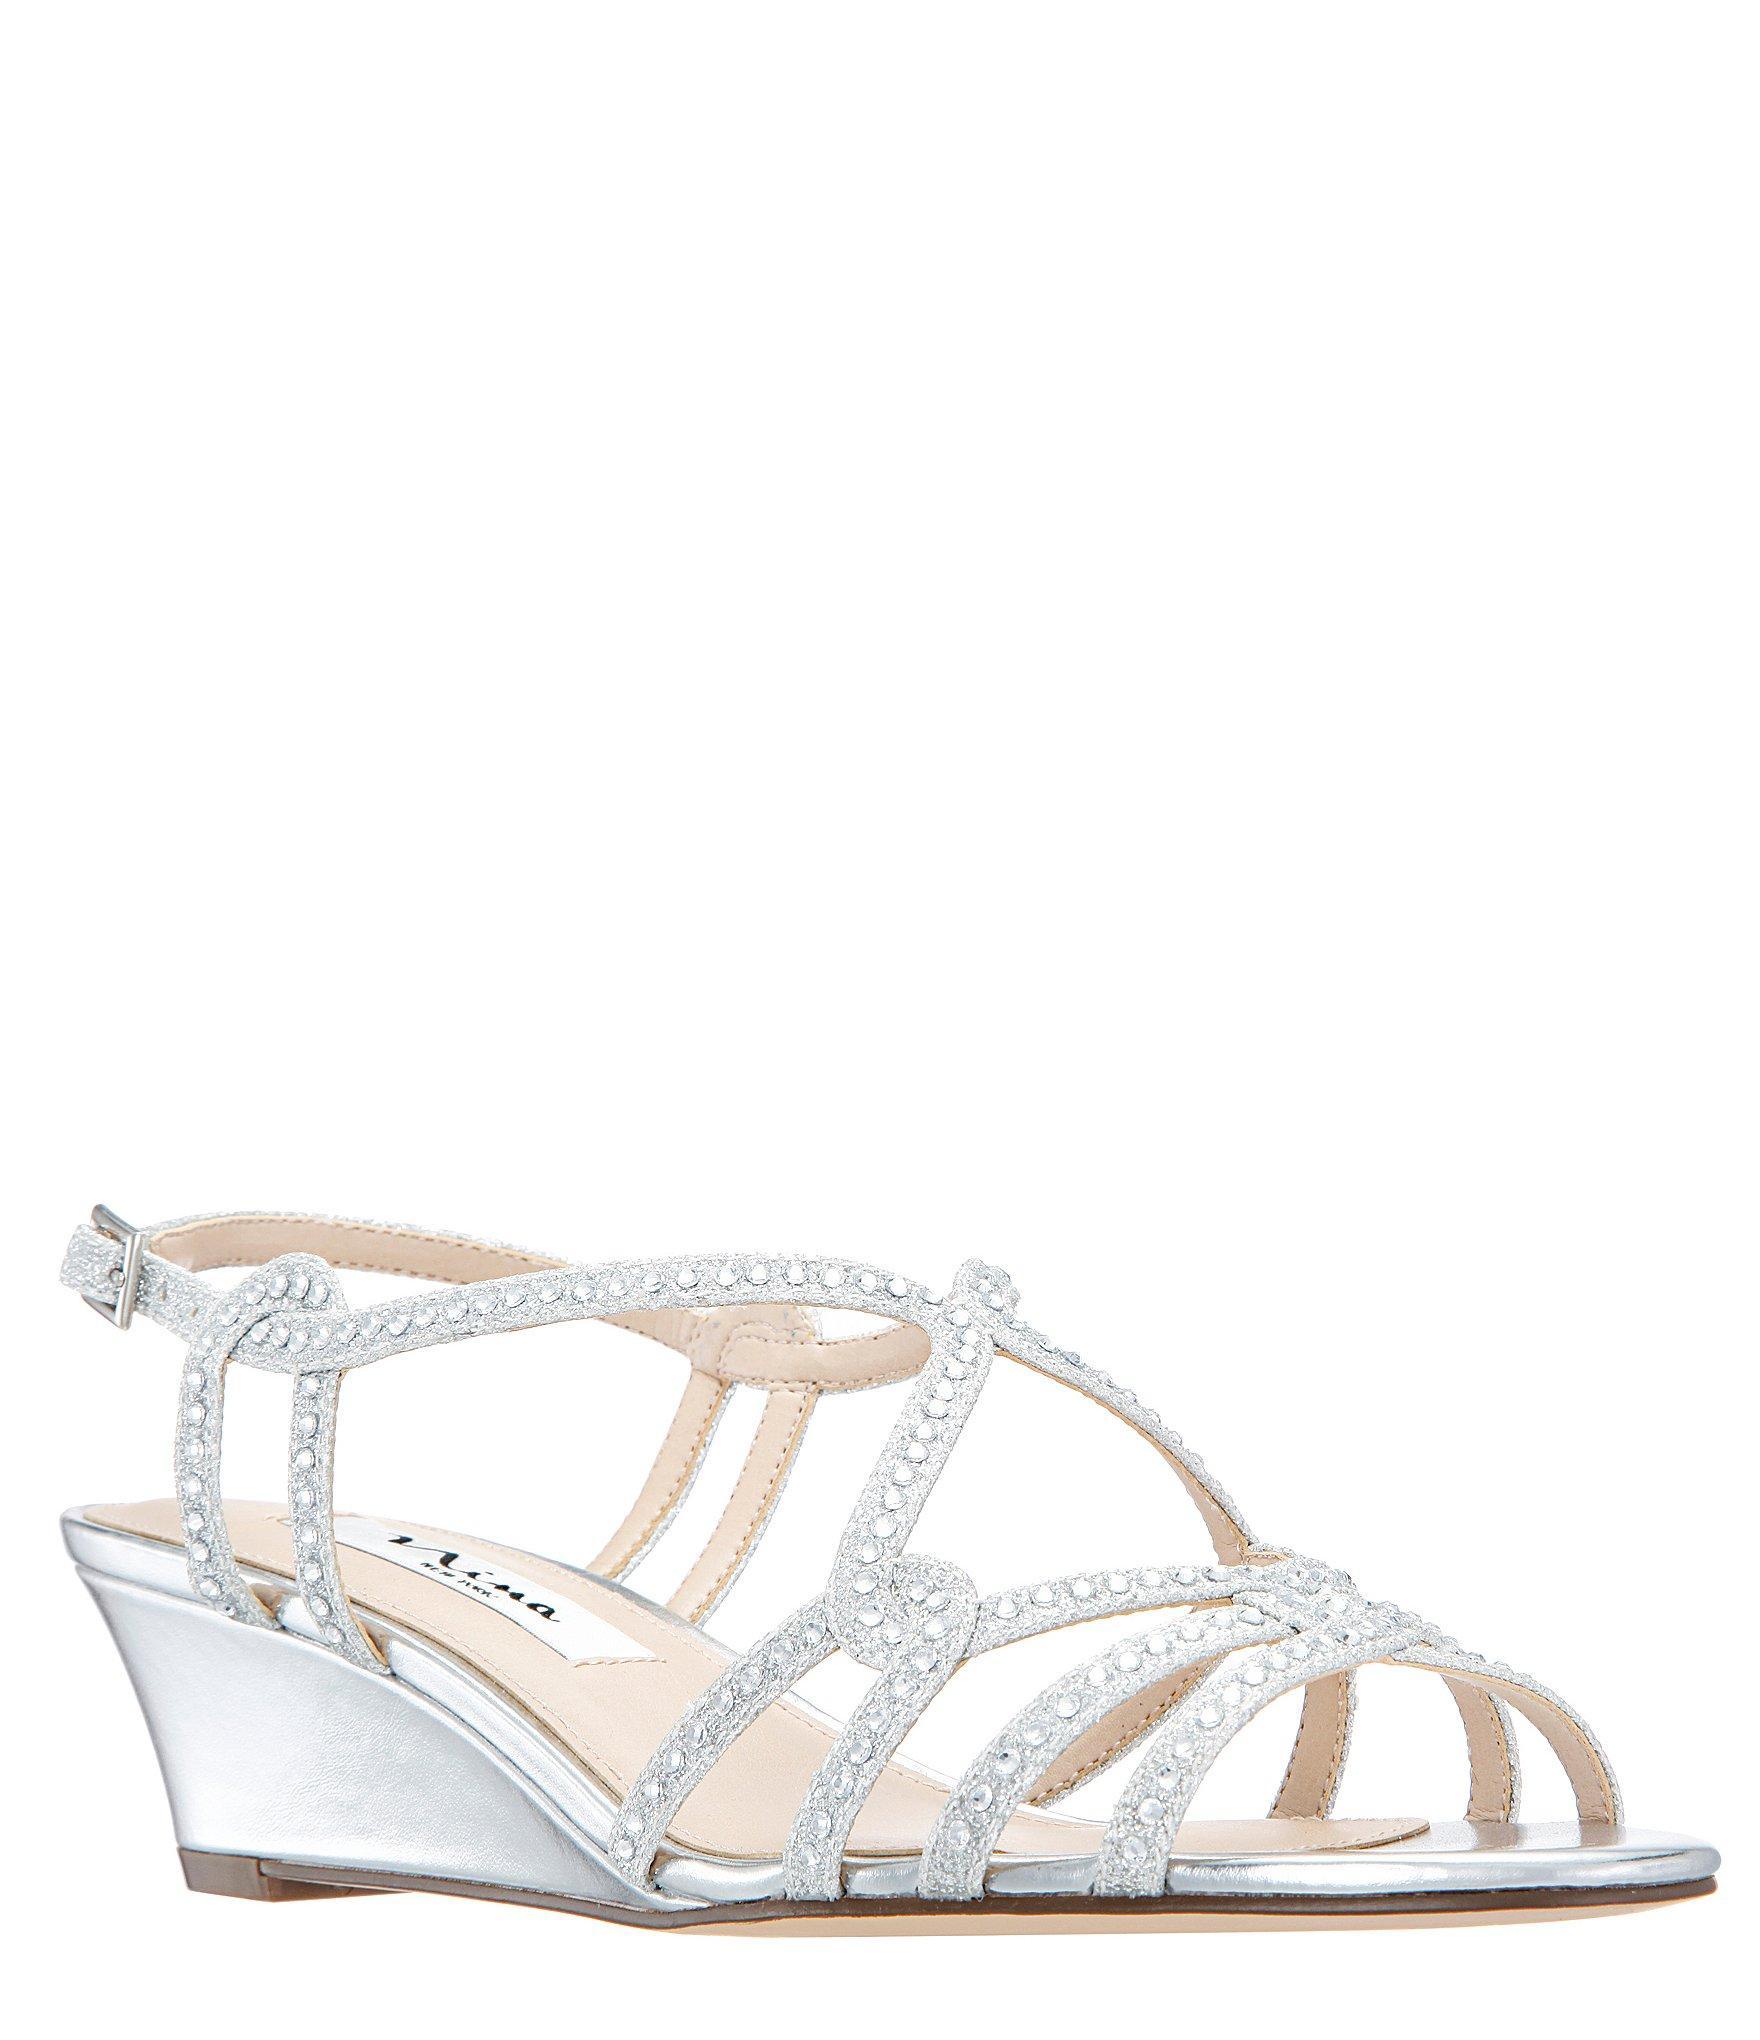 fcea9e5c9 Lyst - Nina Fynlee Glitter Wedge Sandals in Metallic